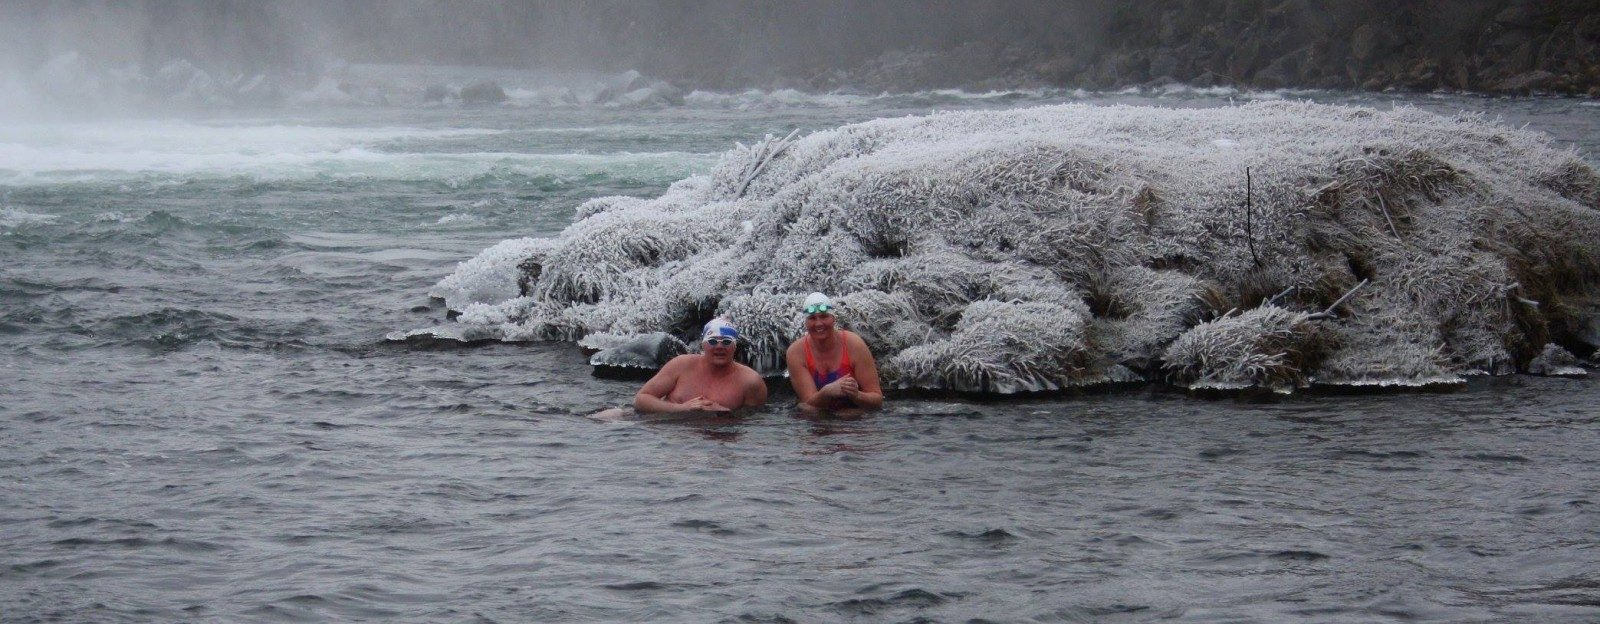 ijszwemmen